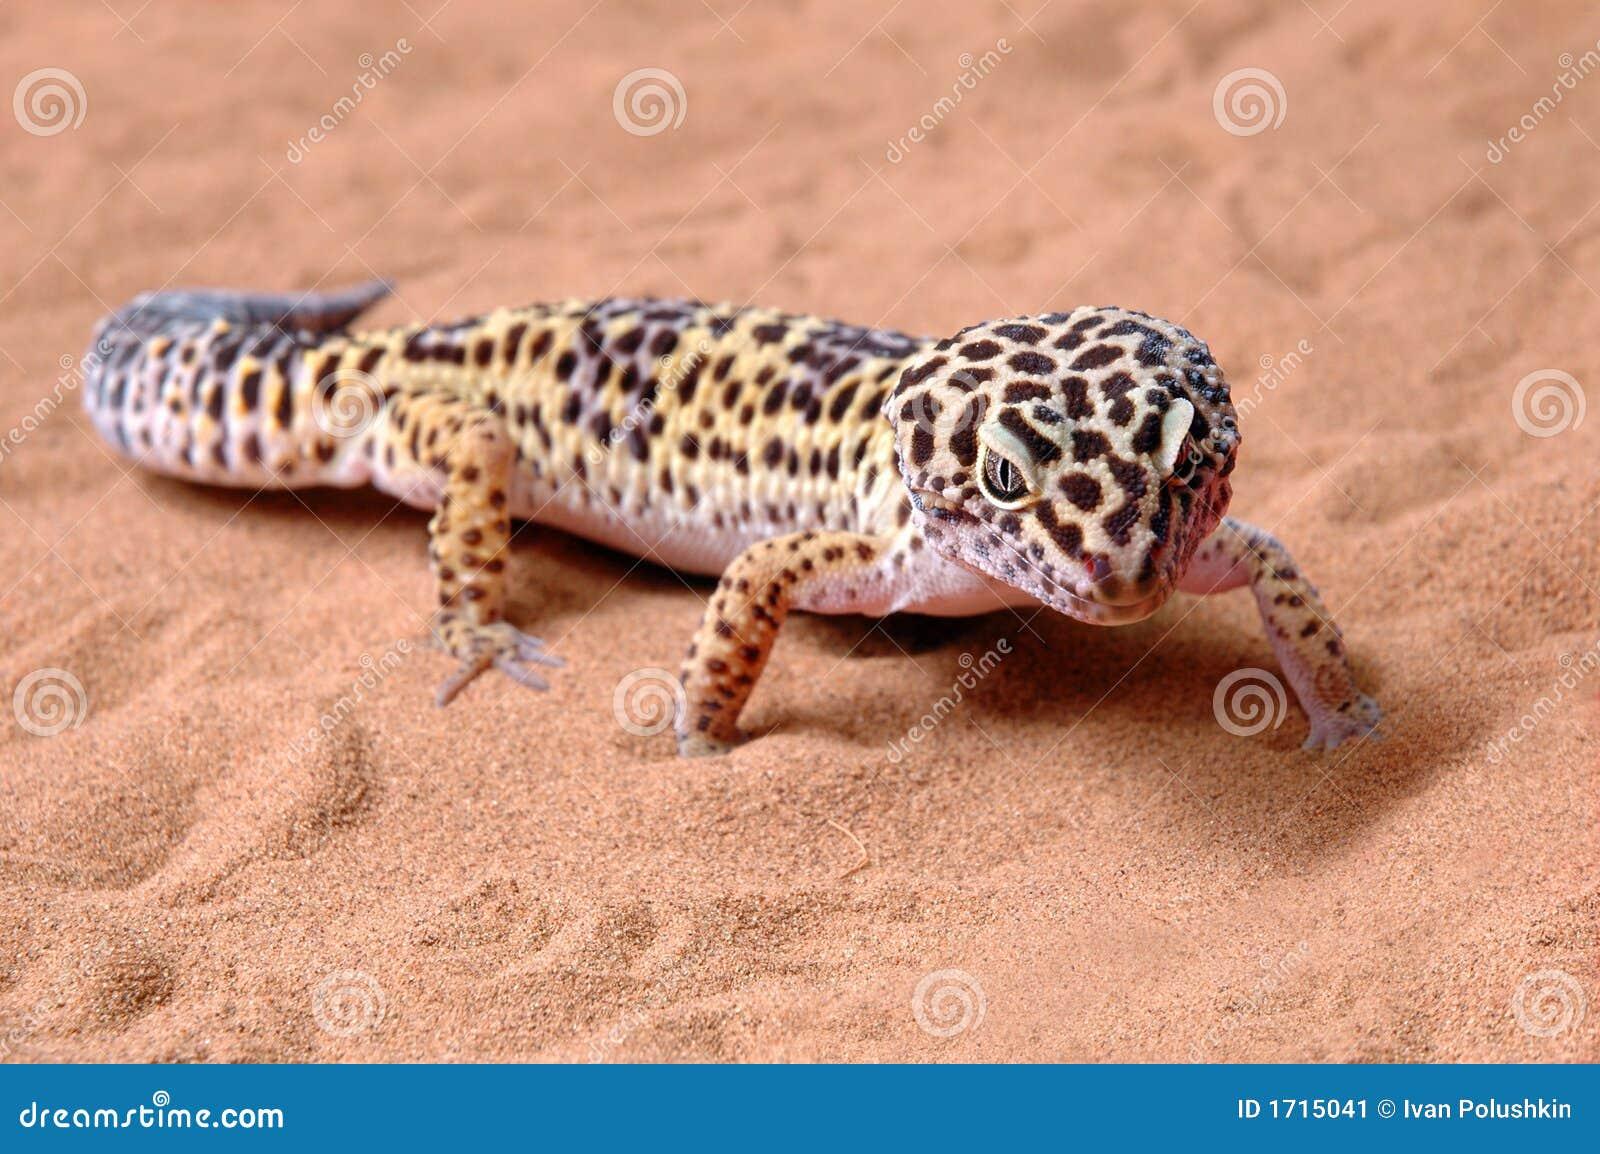 Gecko leopard on sand